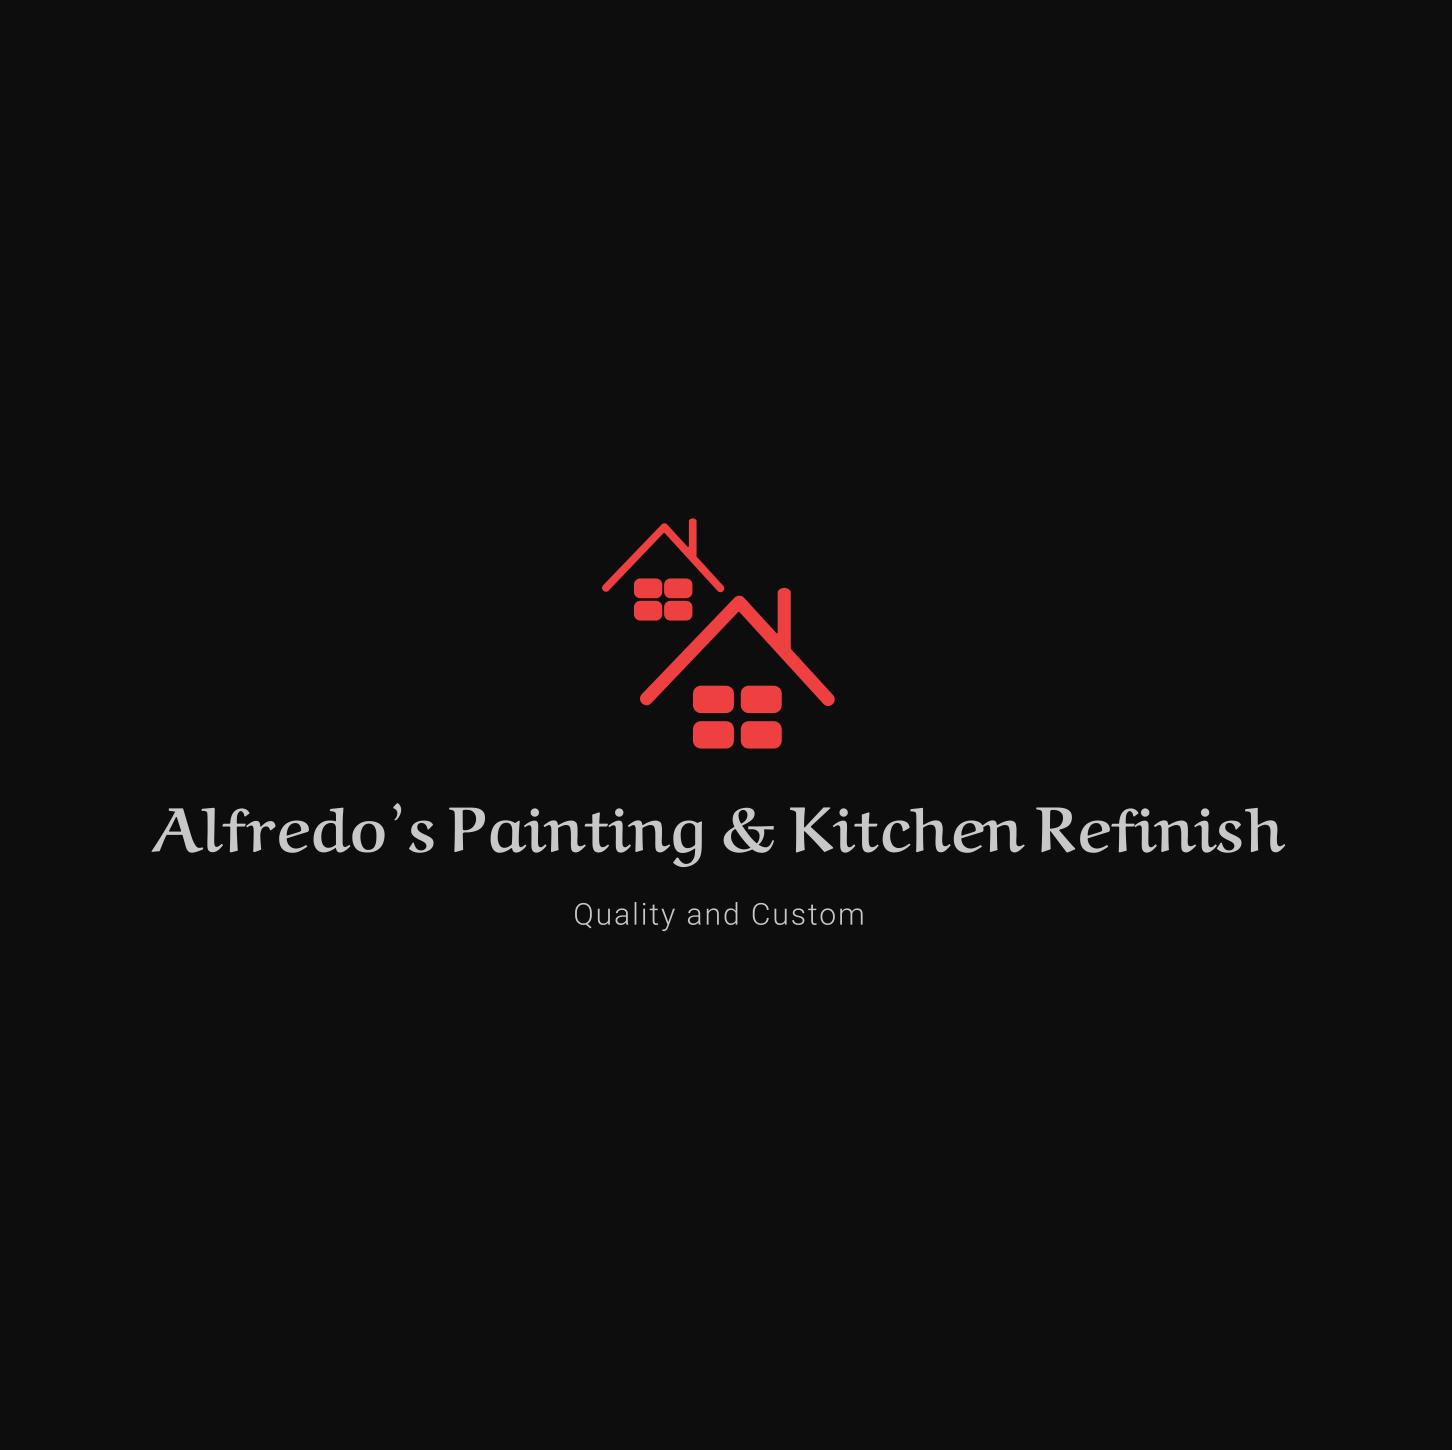 Alfredo's Painting